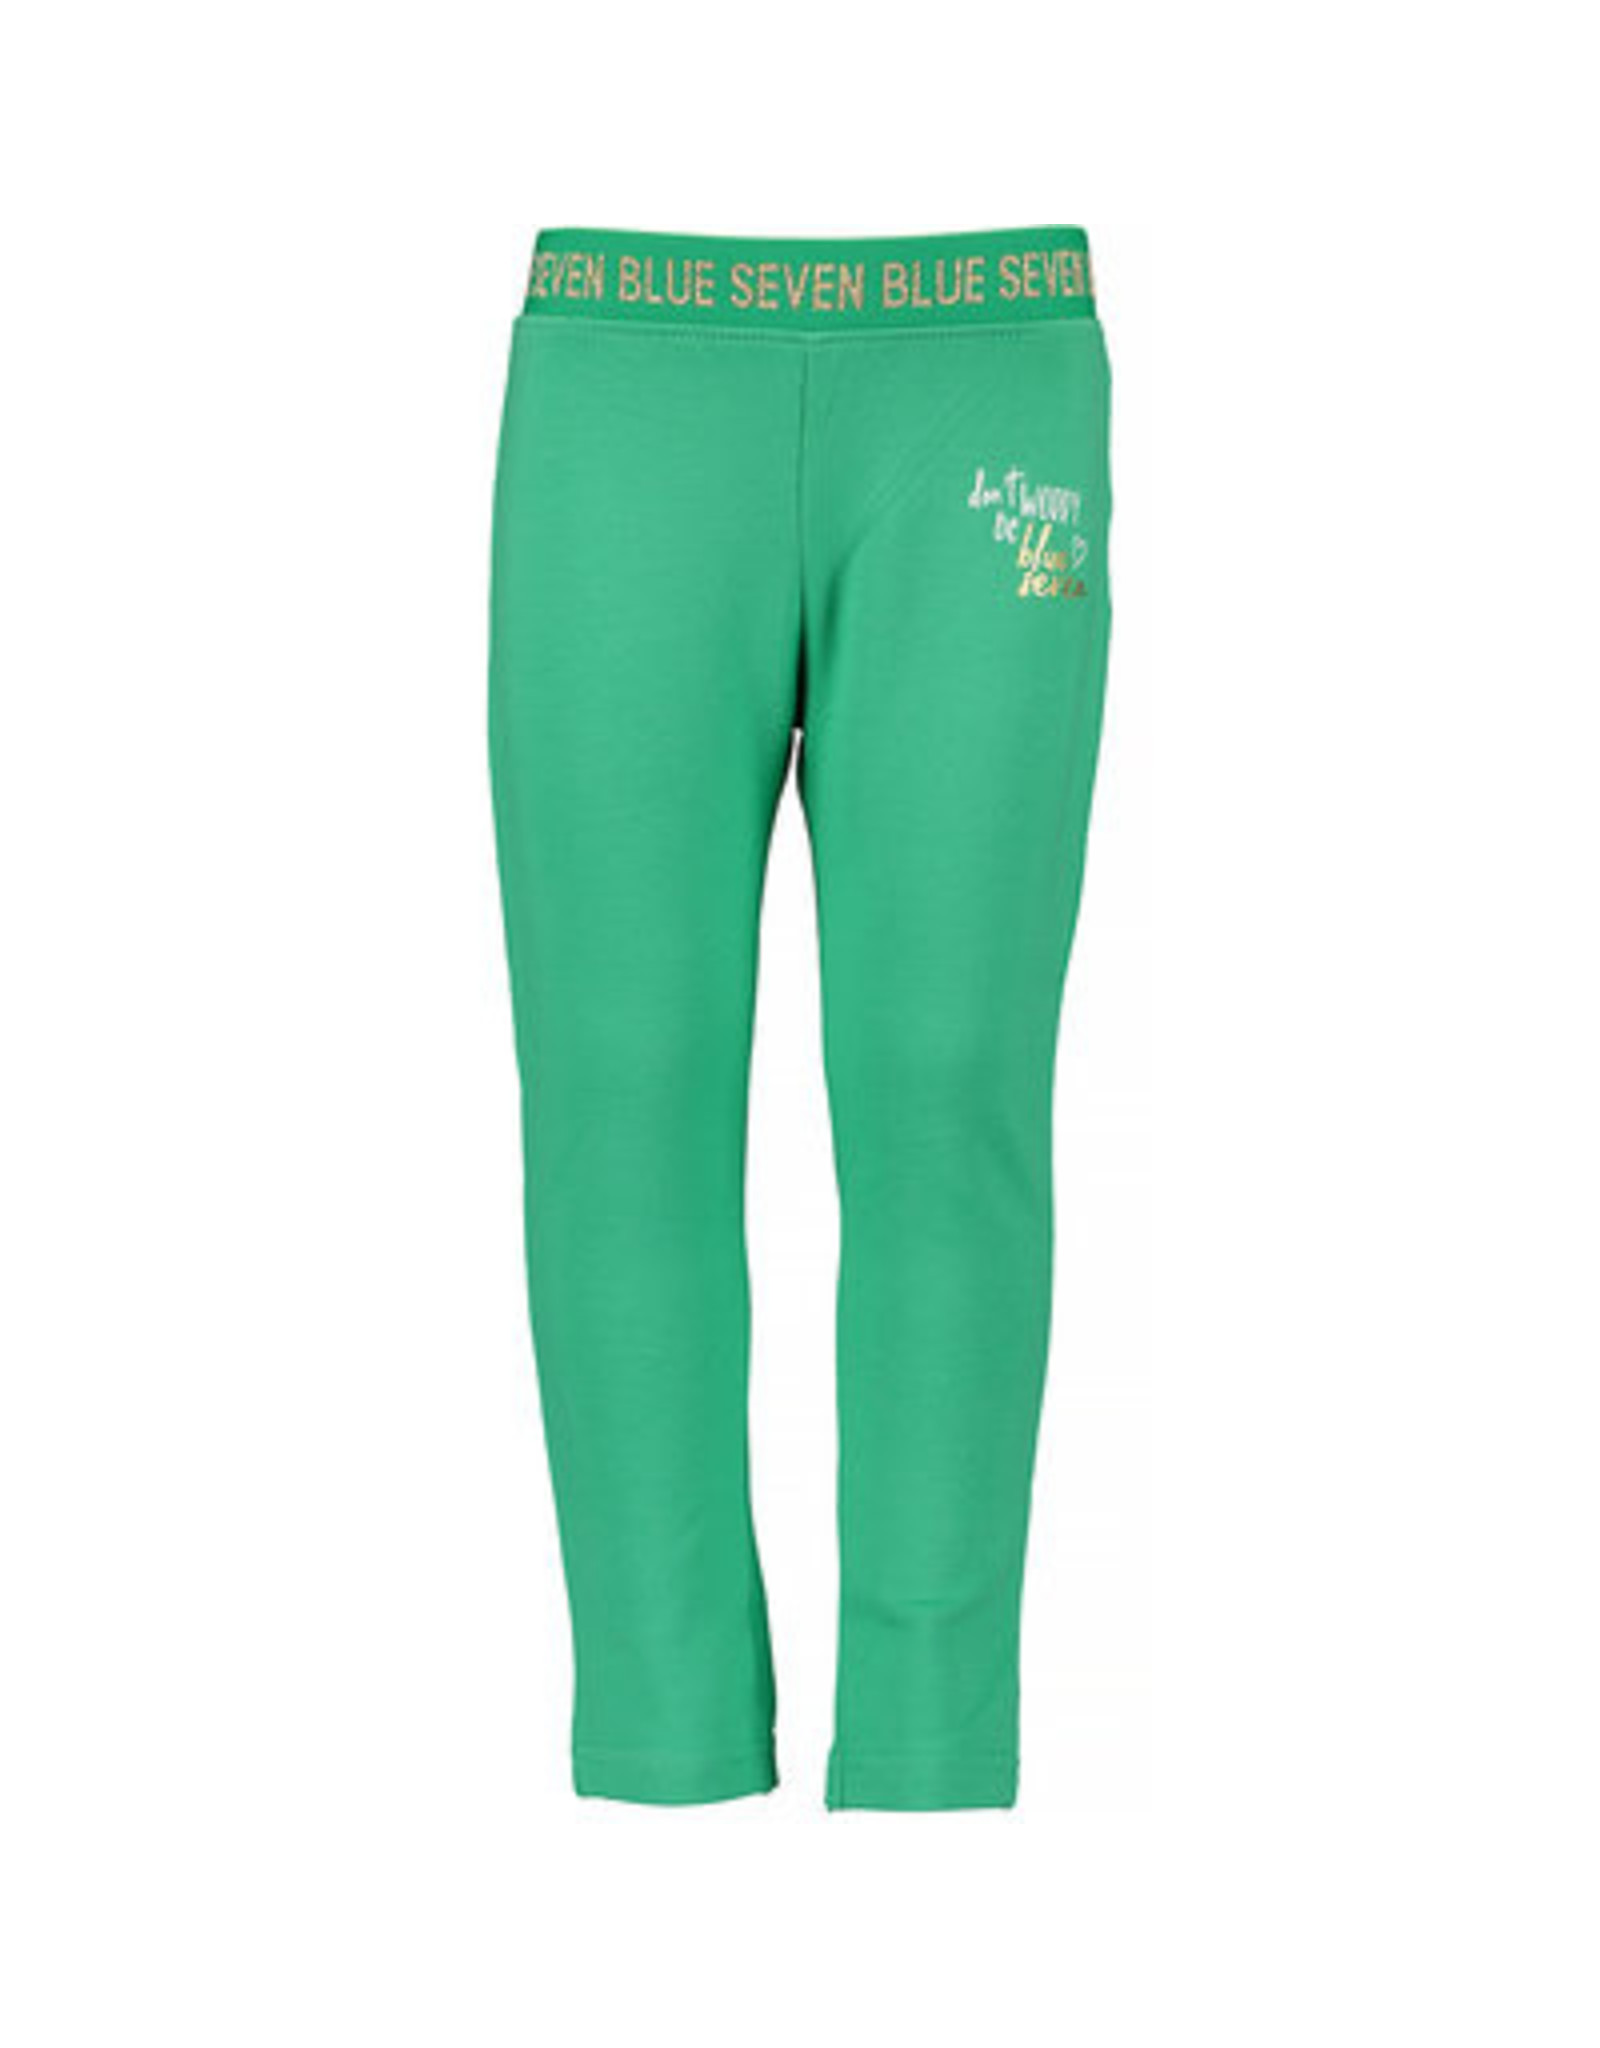 Blue Seven Blue Seven meisjes legging Shiny Brand Green